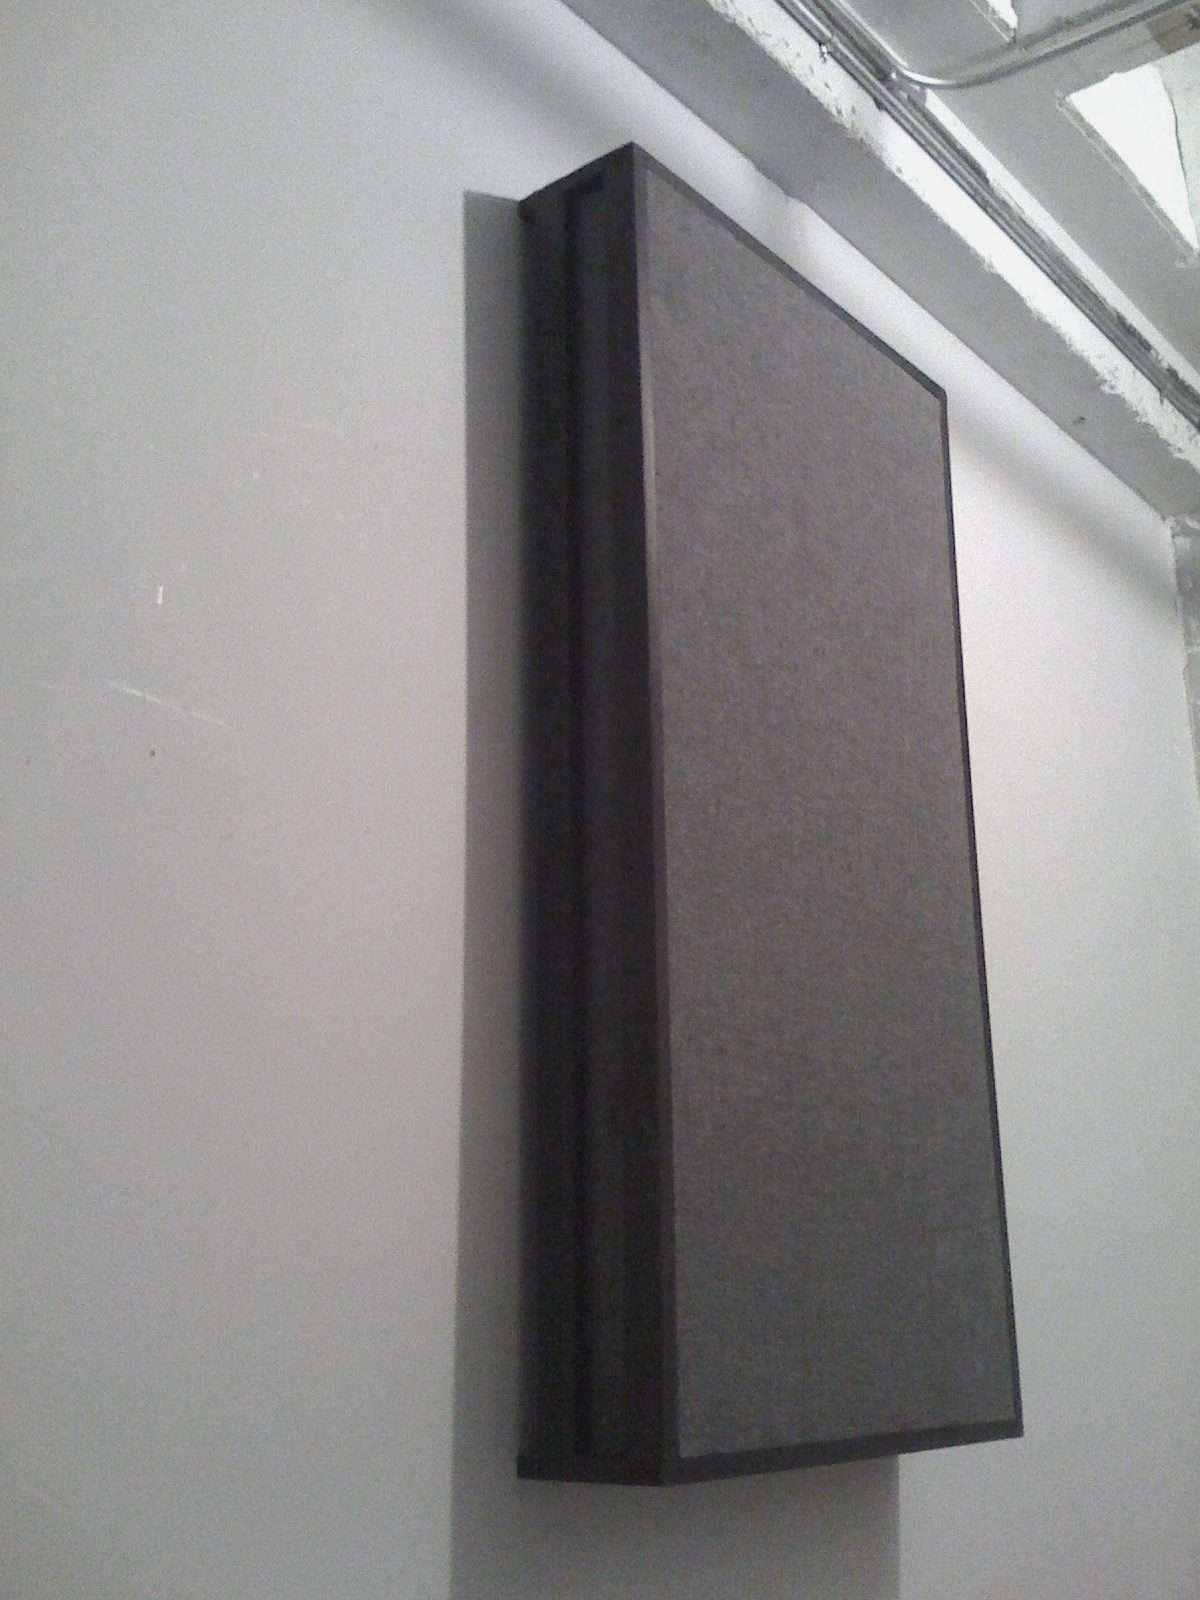 Another Acoustic Panel Gearslutz Pro Audio Community